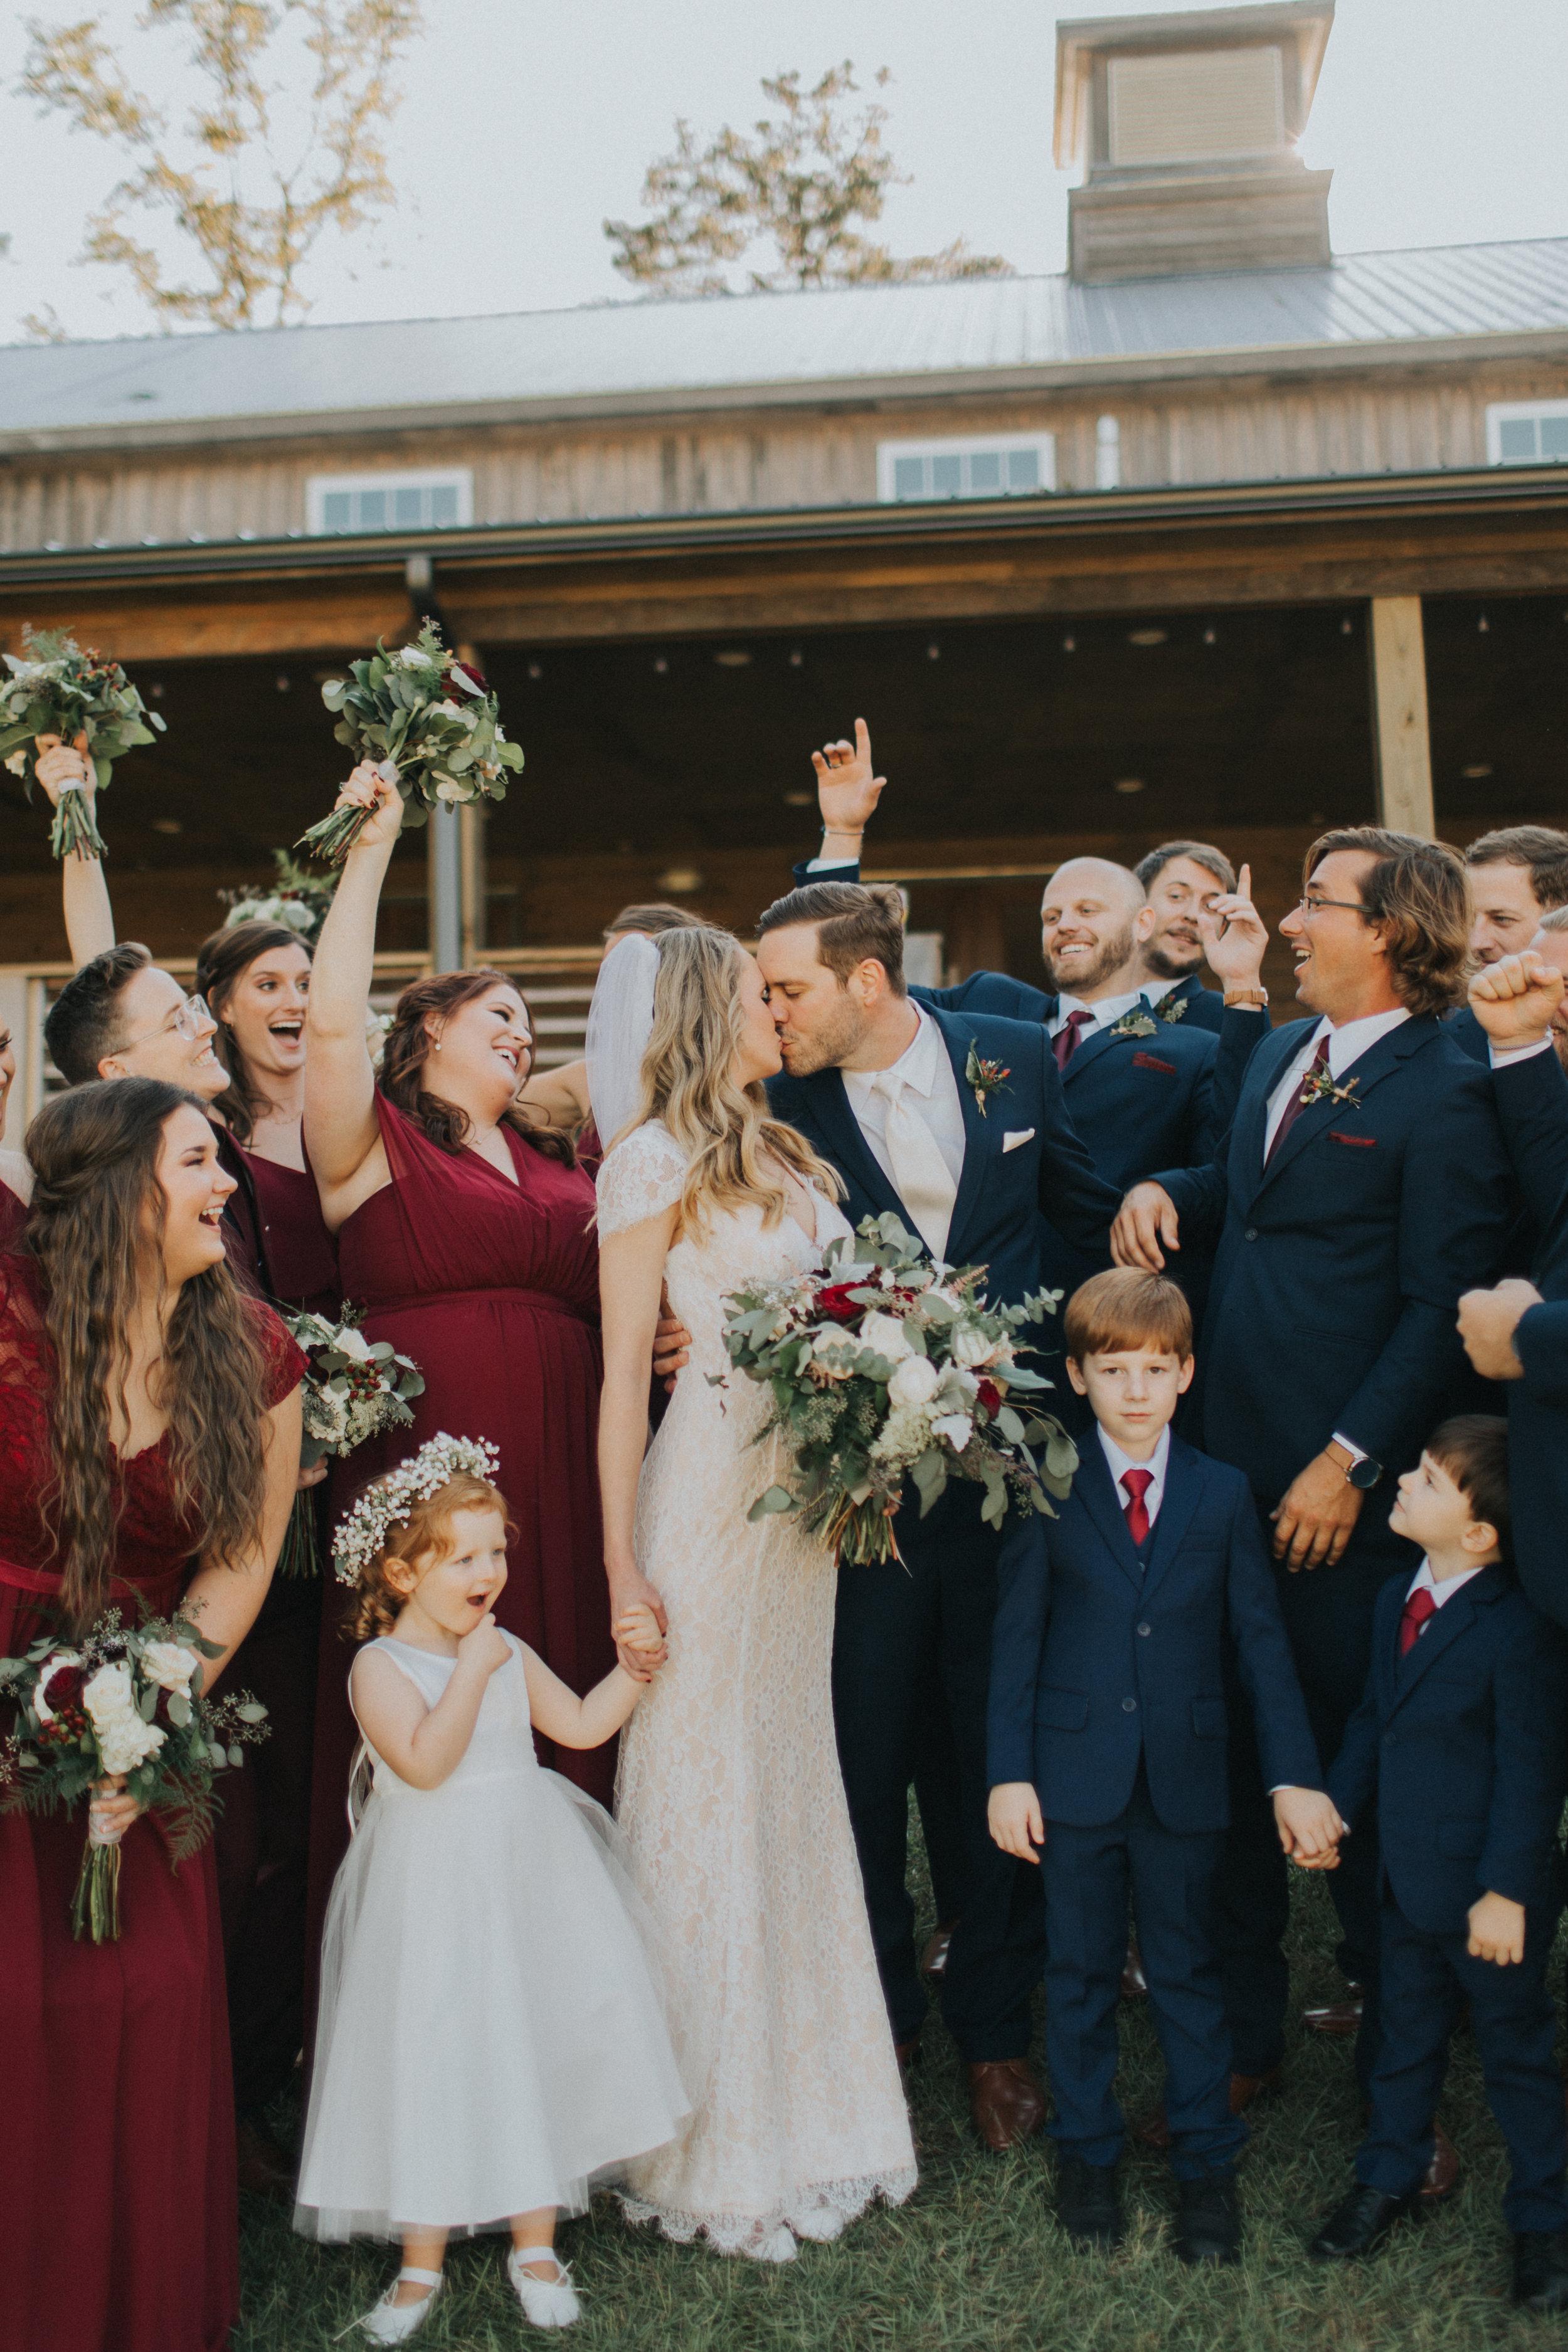 New-Bern-Wedding-Photographer-Christian-Reyes-Photography-6.jpg